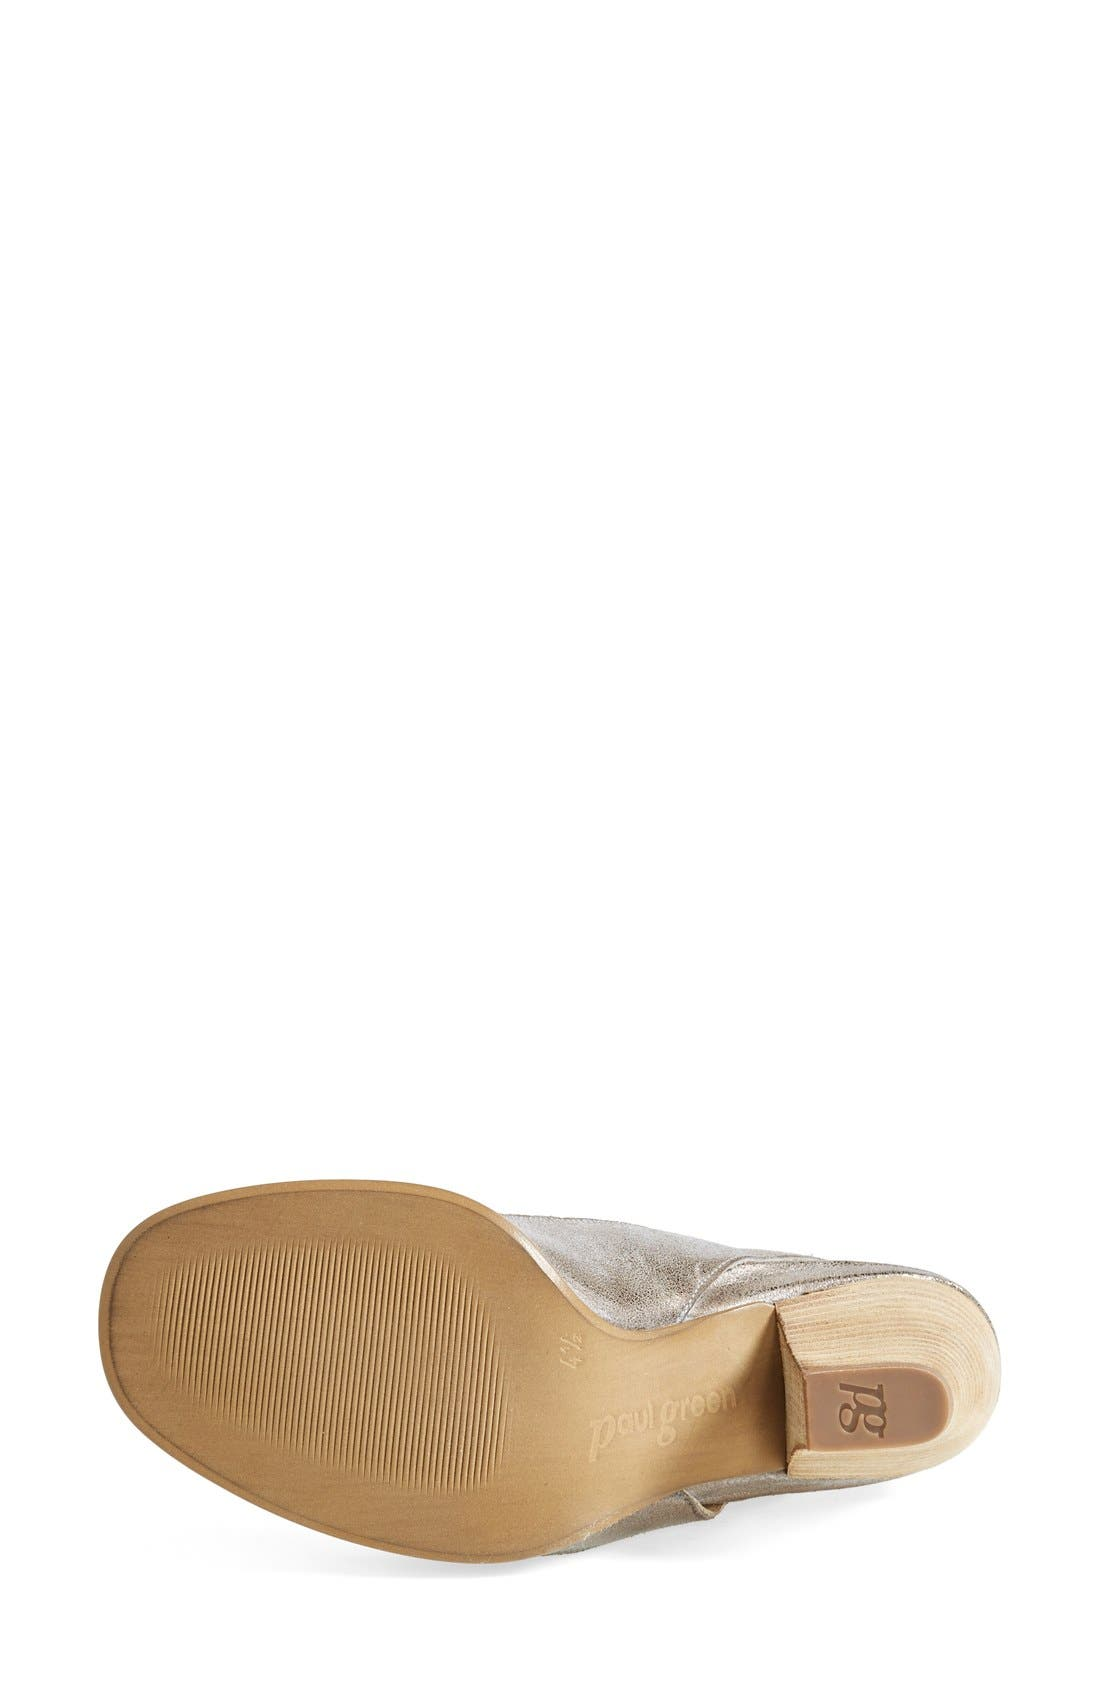 'Cayanne' Leather Peep Toe Sandal,                             Alternate thumbnail 35, color,